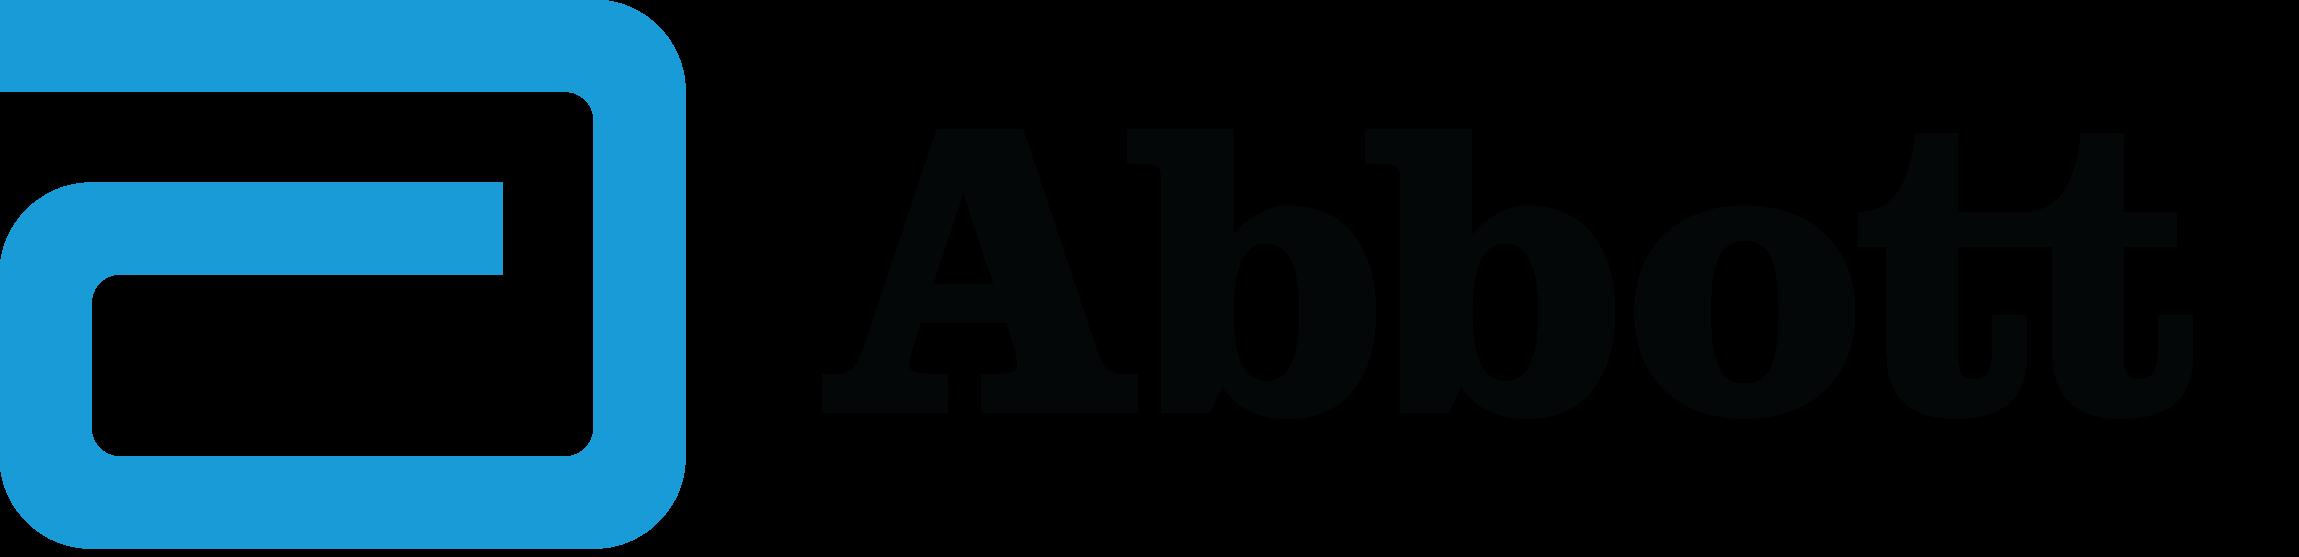 Abbott_LTTF_HOR_RGB_HR